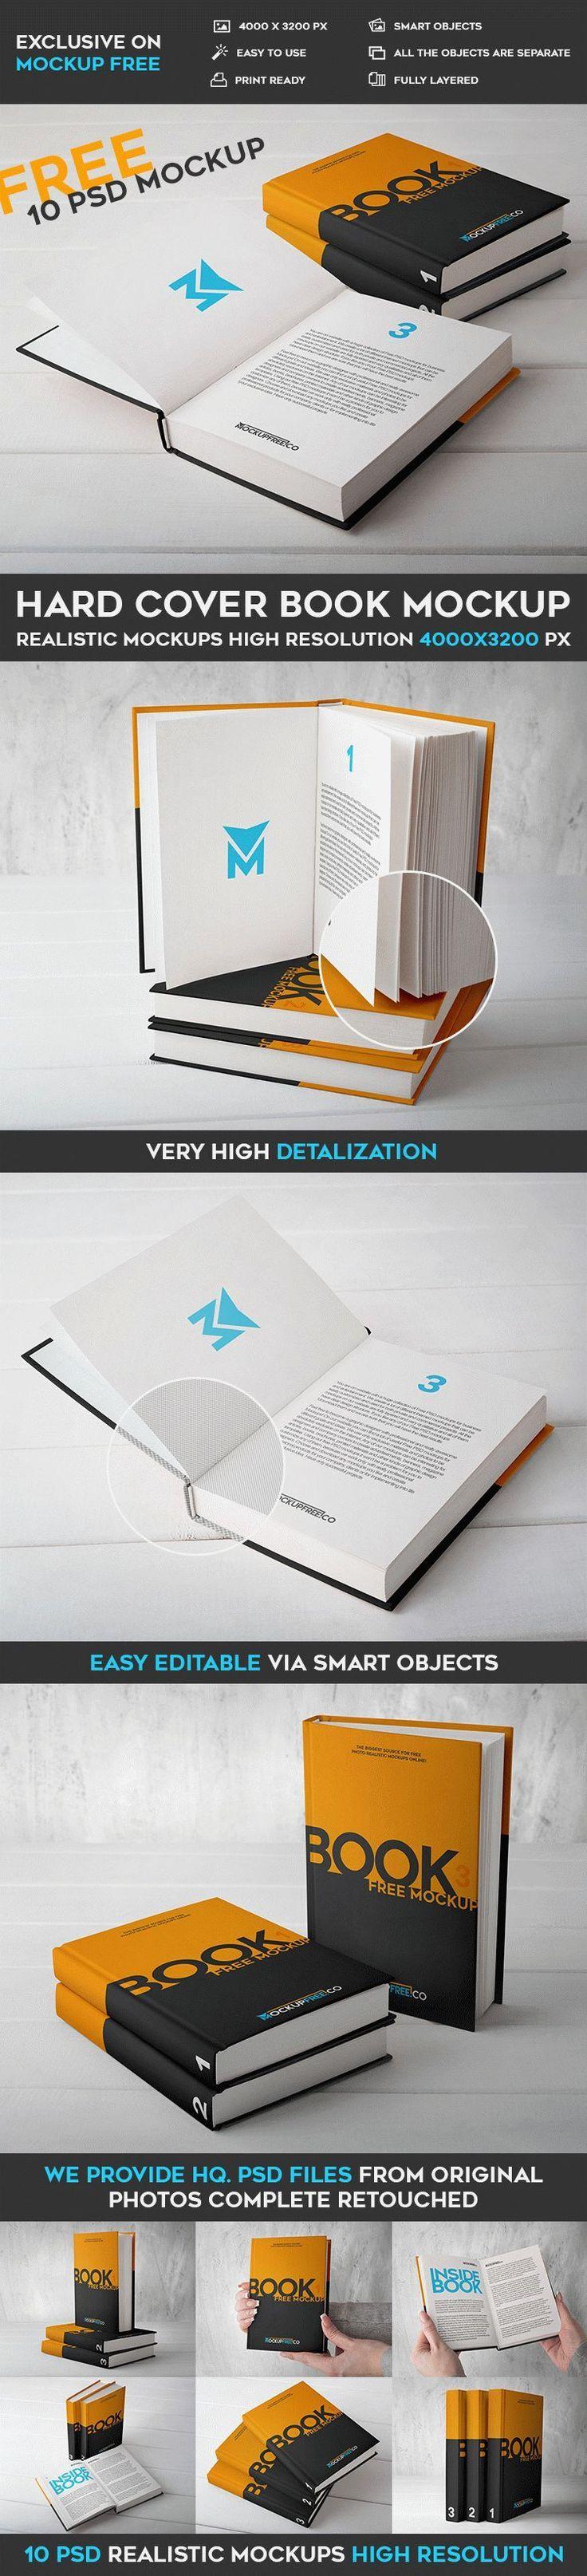 Hard Cover Book - 10 Premium High Quality PSD Mockups